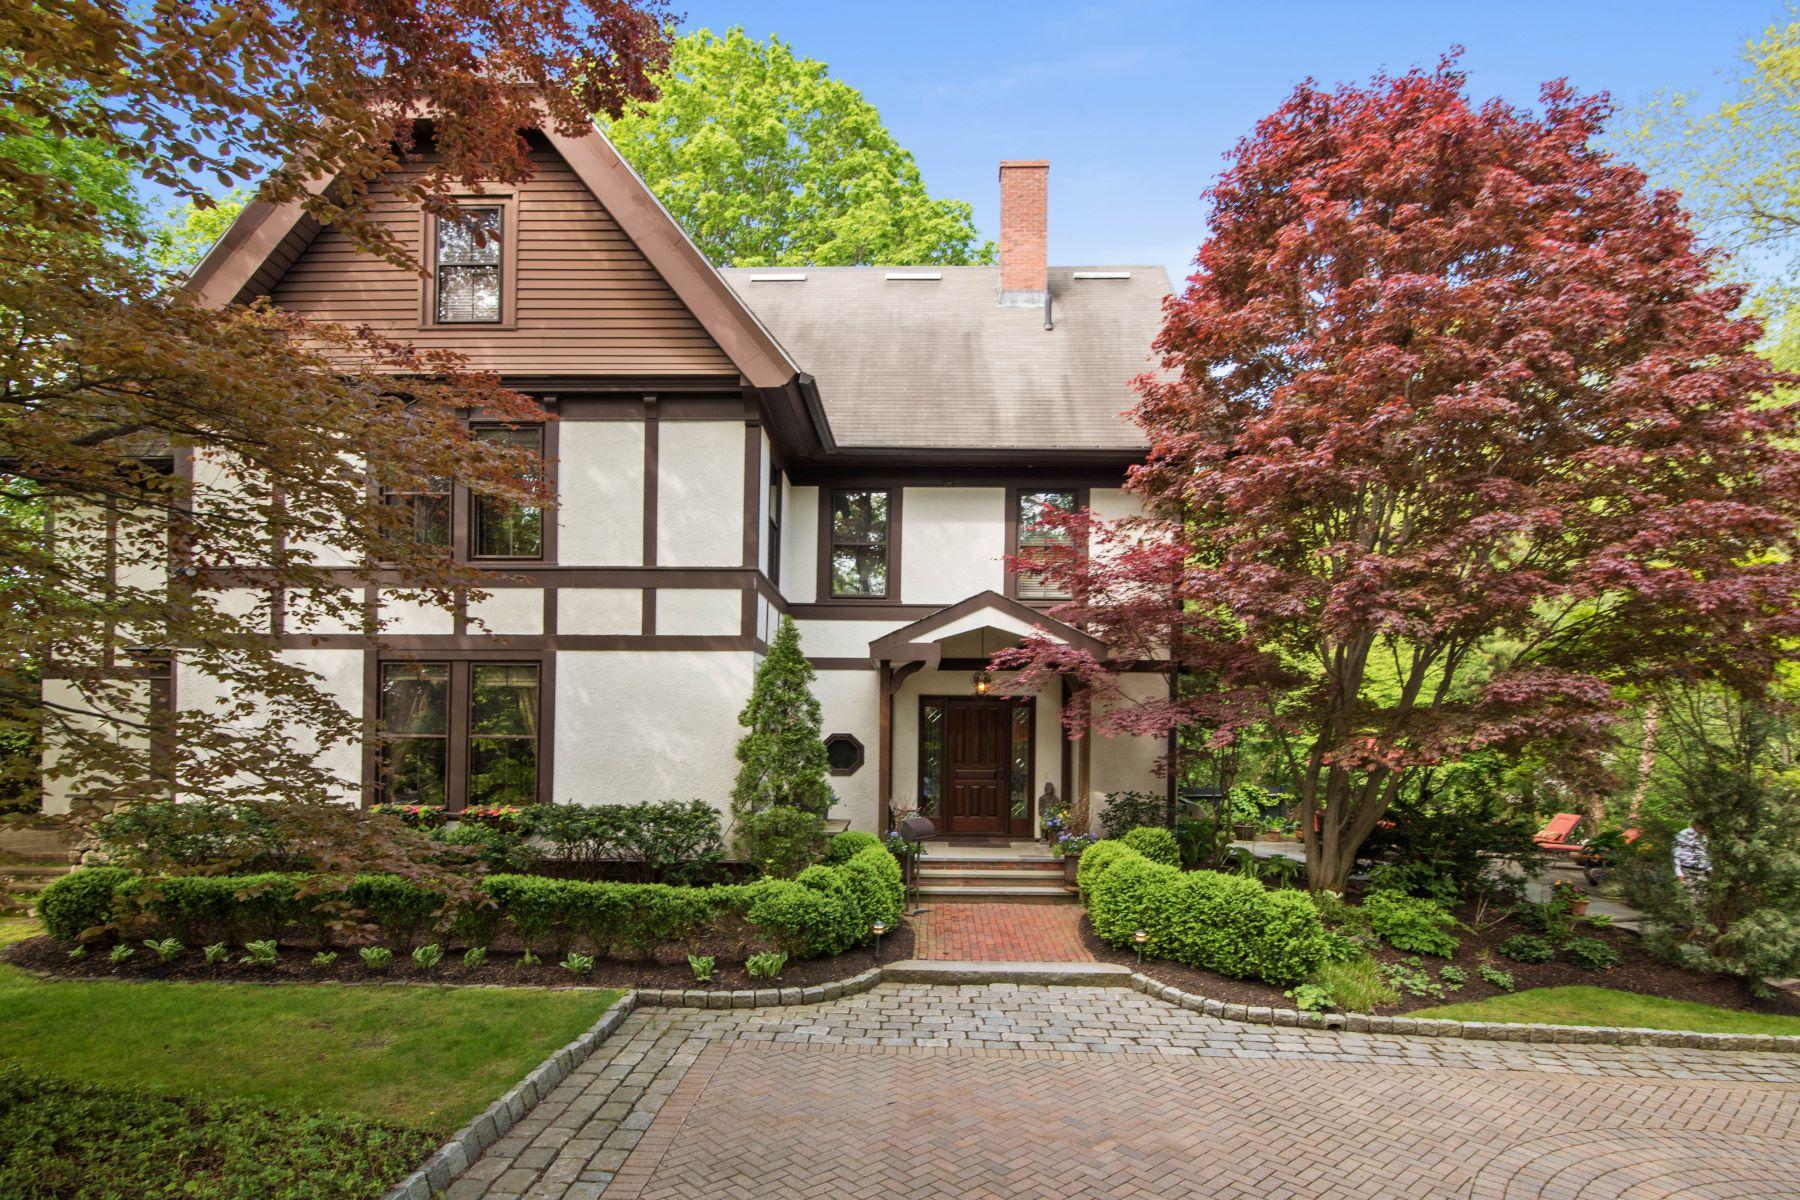 Moradia para Venda às Beautifully Renovated Antique Home - Motivated Seller 535-537 Worcester Street Wellesley, Massachusetts, 02481 Estados Unidos